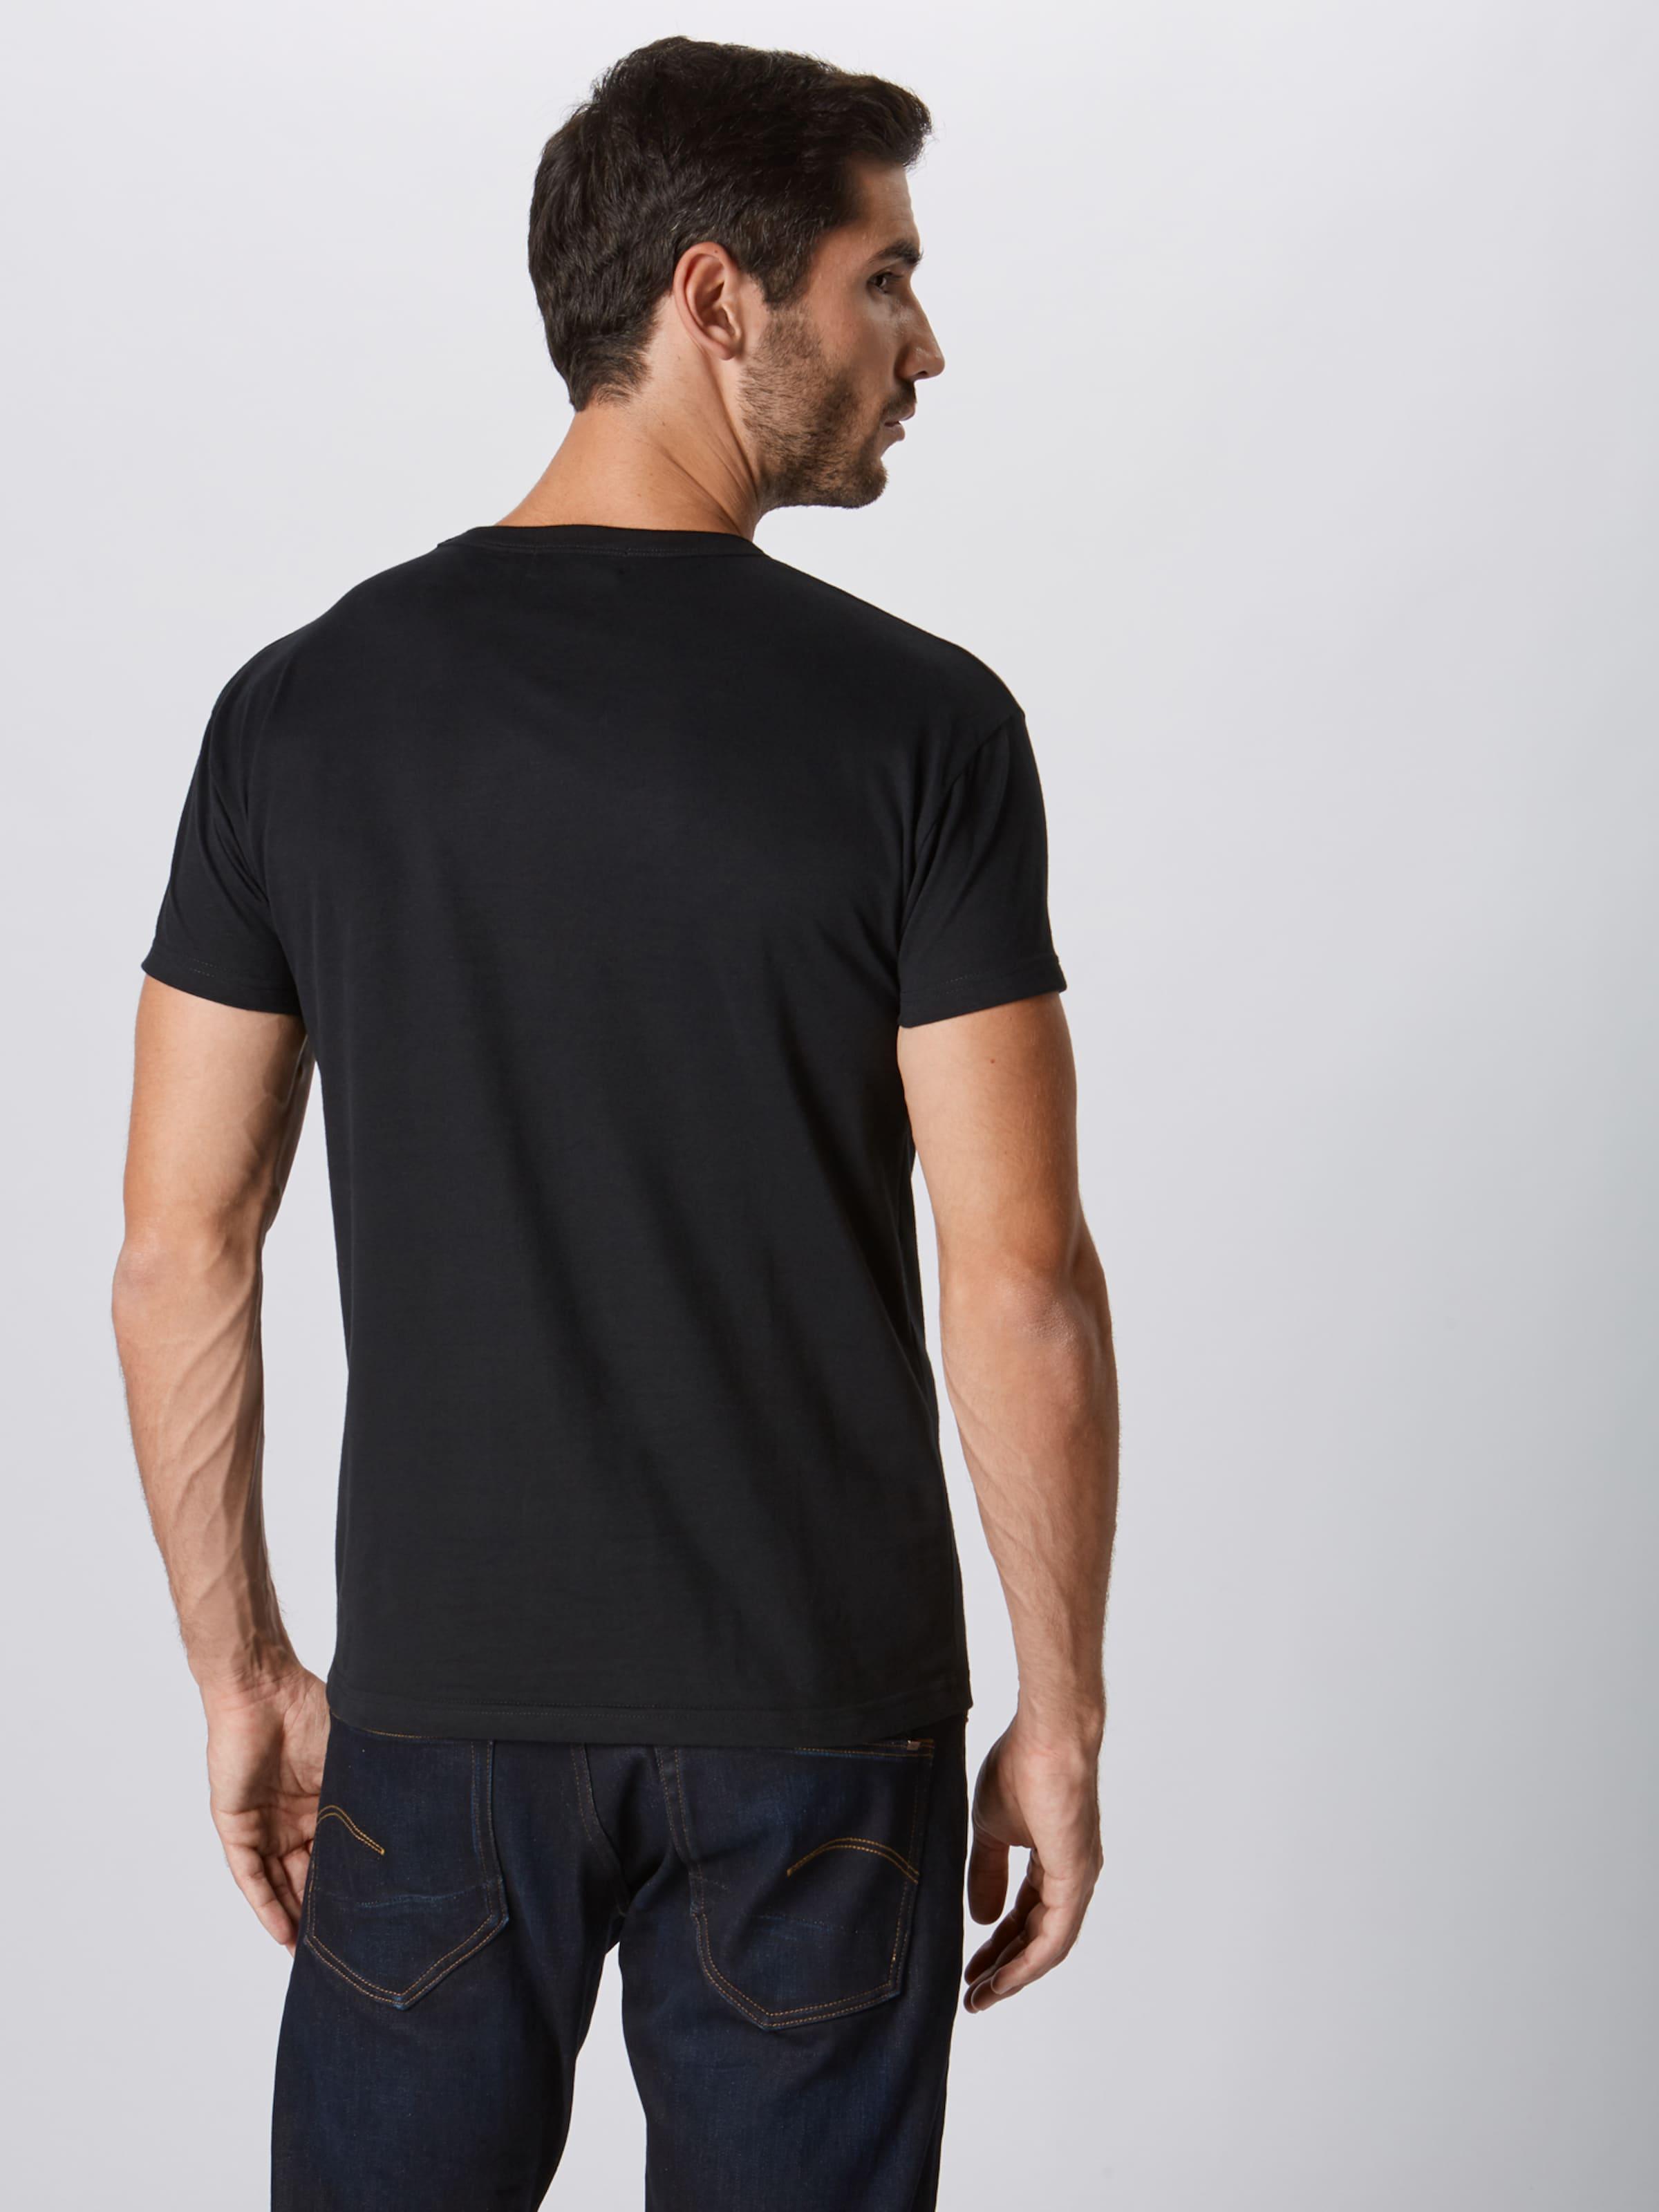 Derbe T Gris En shirt T En En Derbe Derbe T Gris shirt shirt FKul13cTJ5